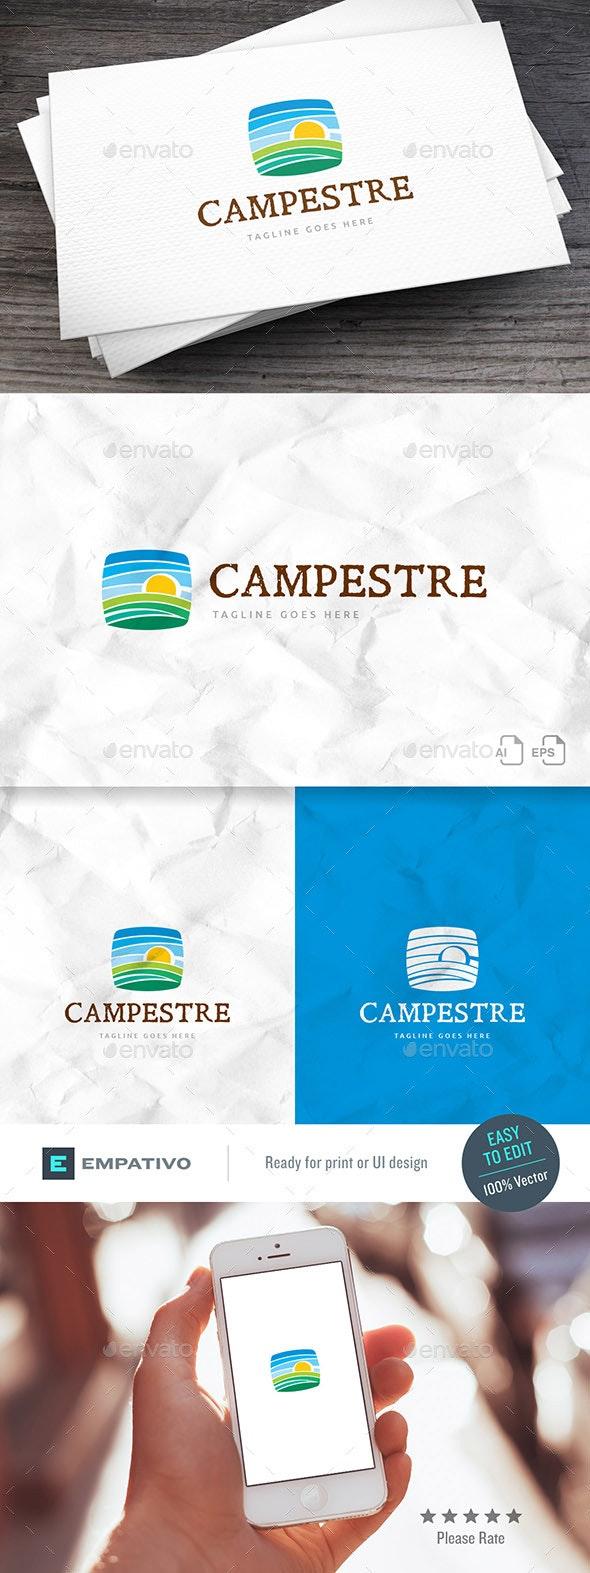 Campestre Logo Template - Nature Logo Templates